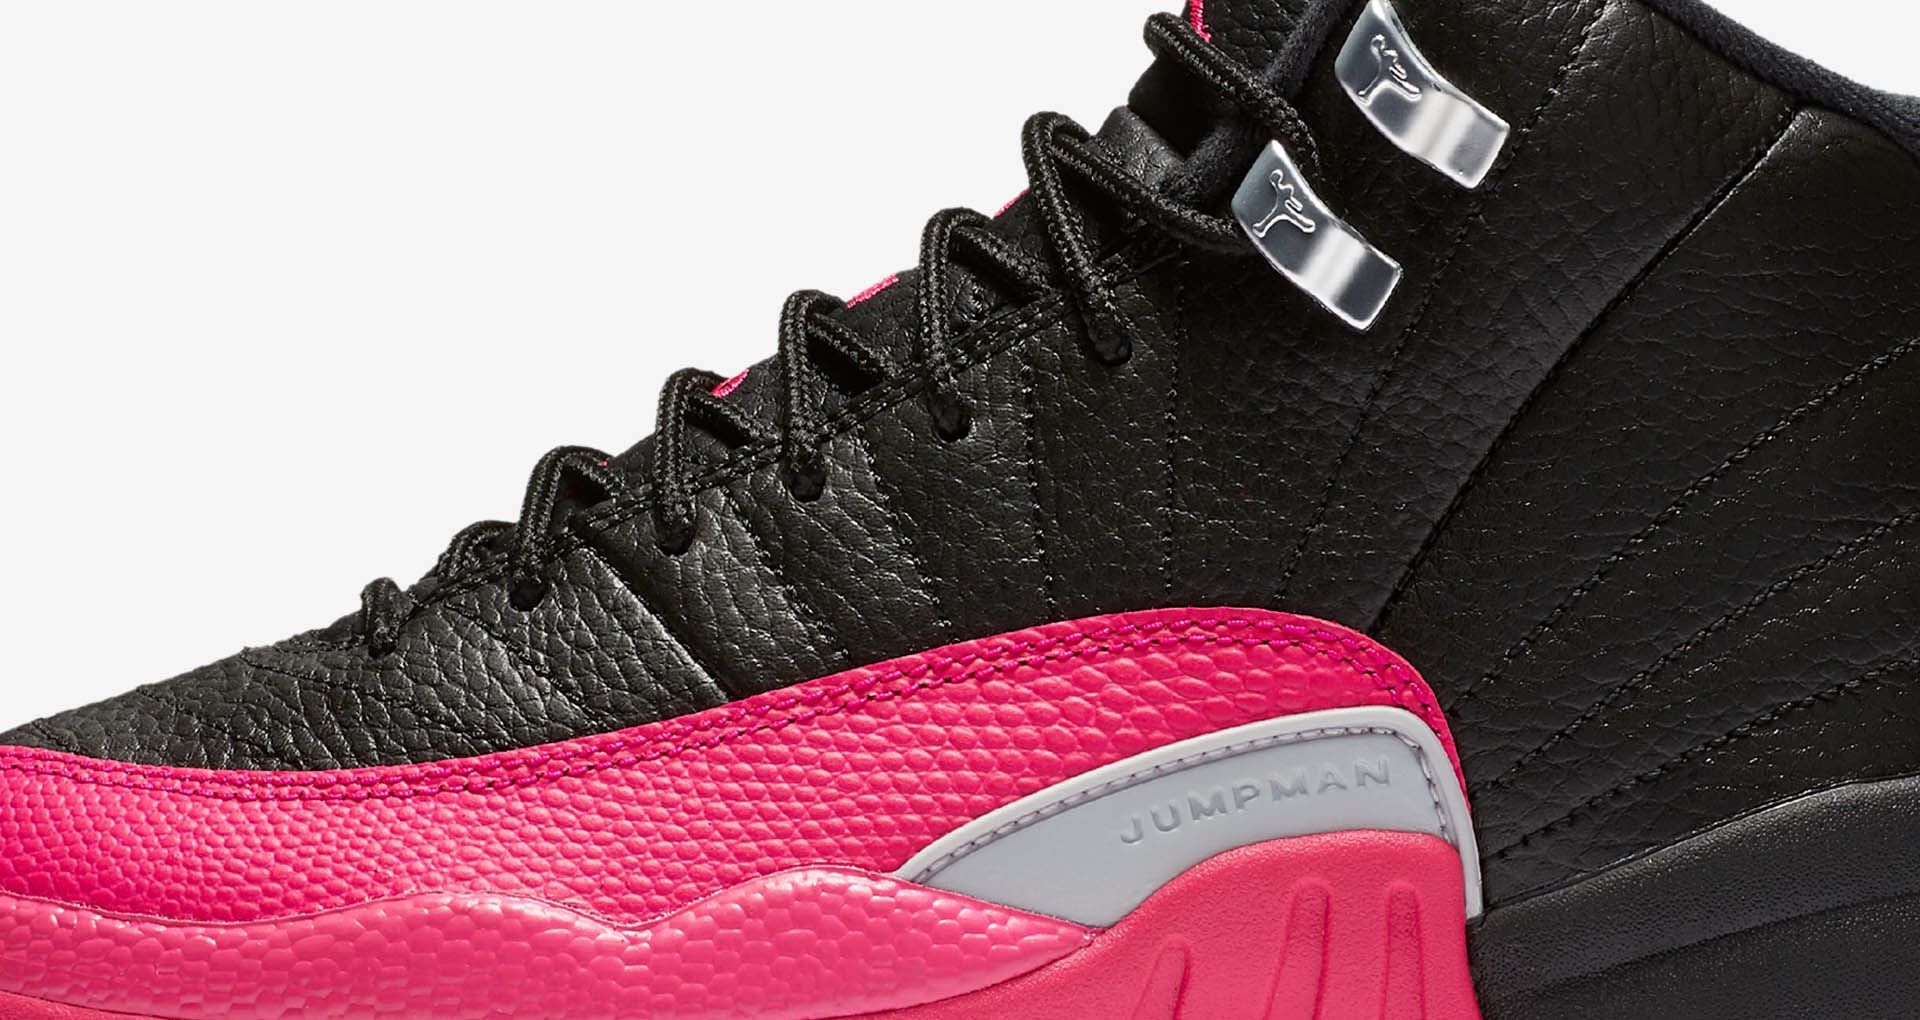 separation shoes 94a95 82a31 Girls  Air Jordan 12 Retro  Black   Deadly Pink  Release Date